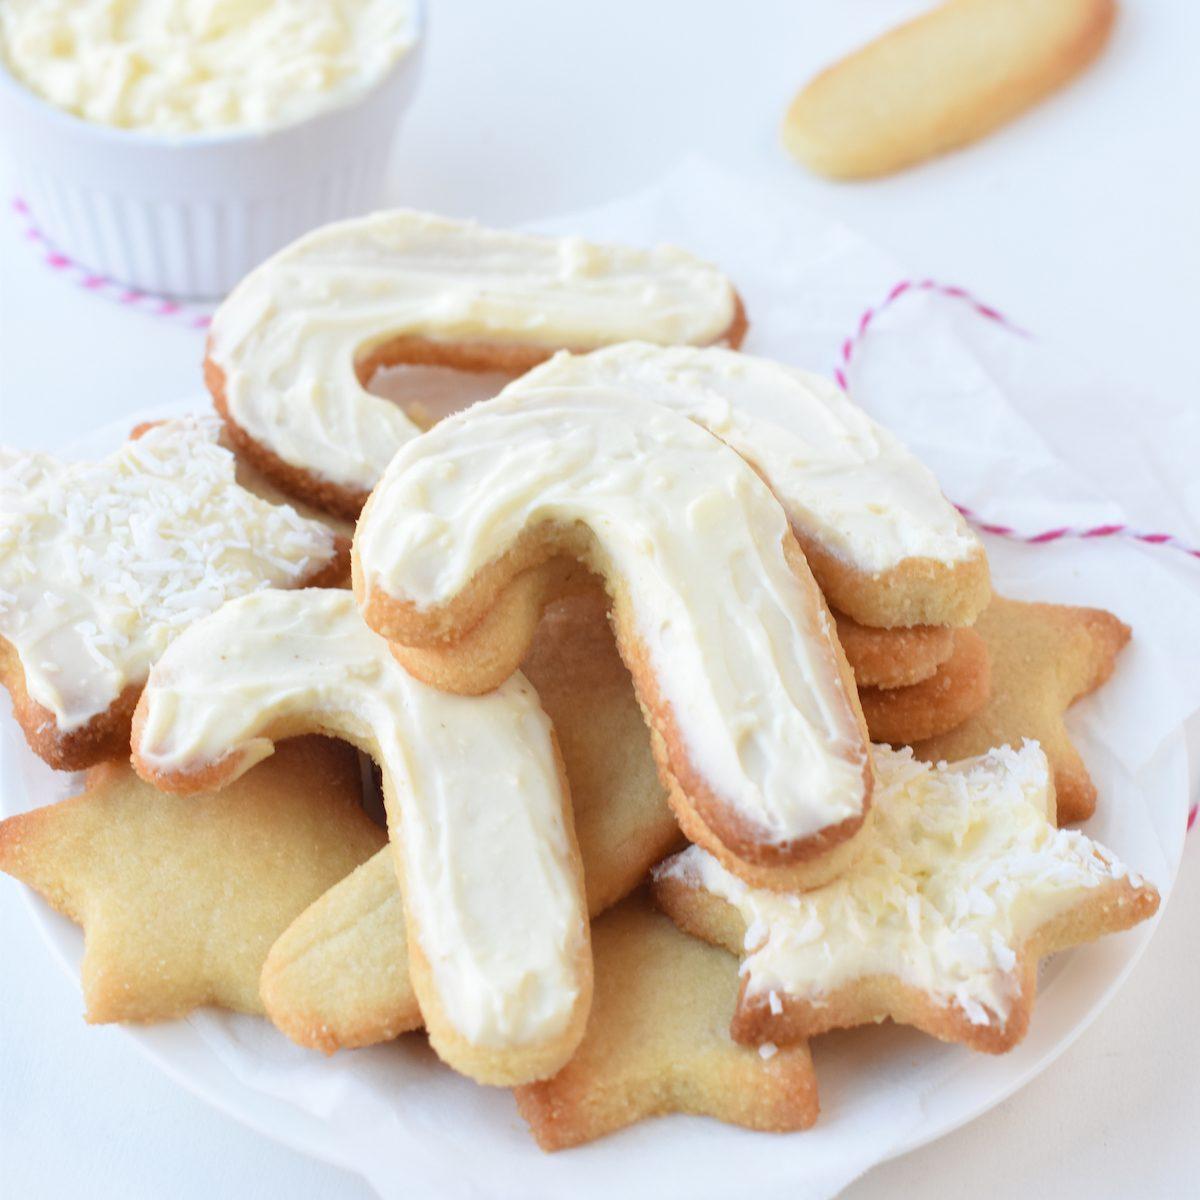 A pile of sugar-free sugar cookies